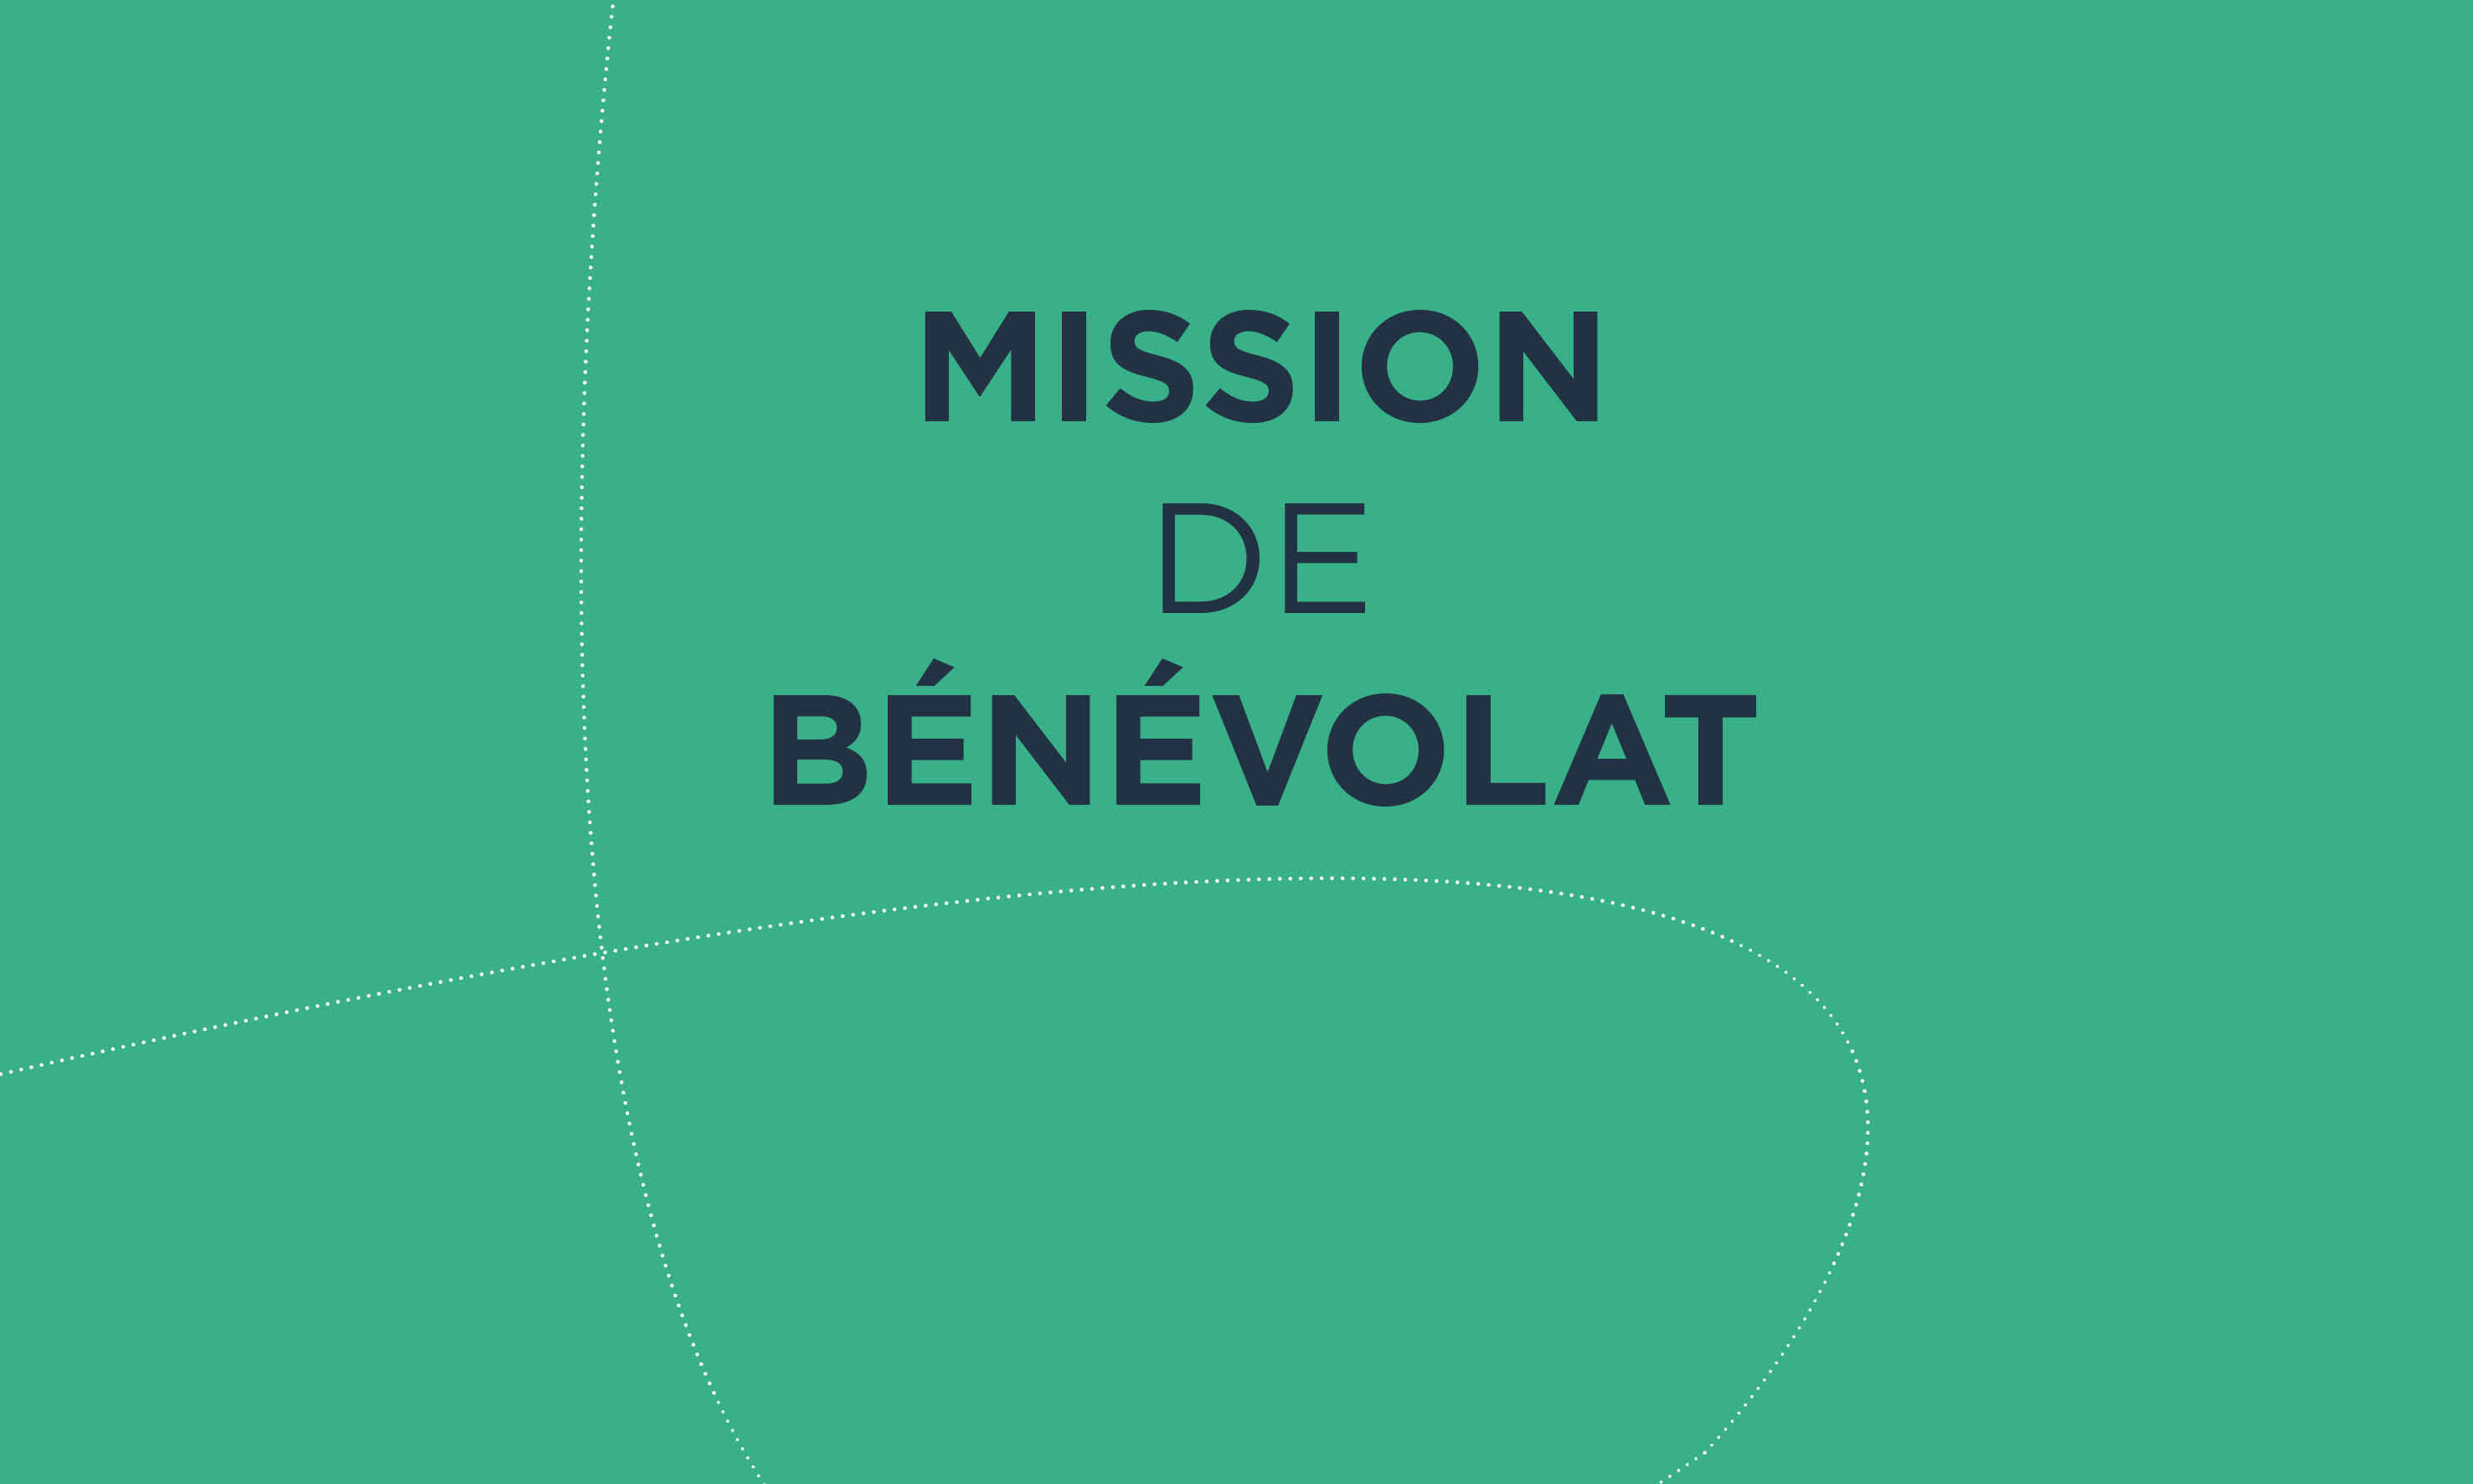 MISSION DE BENEVOLAT